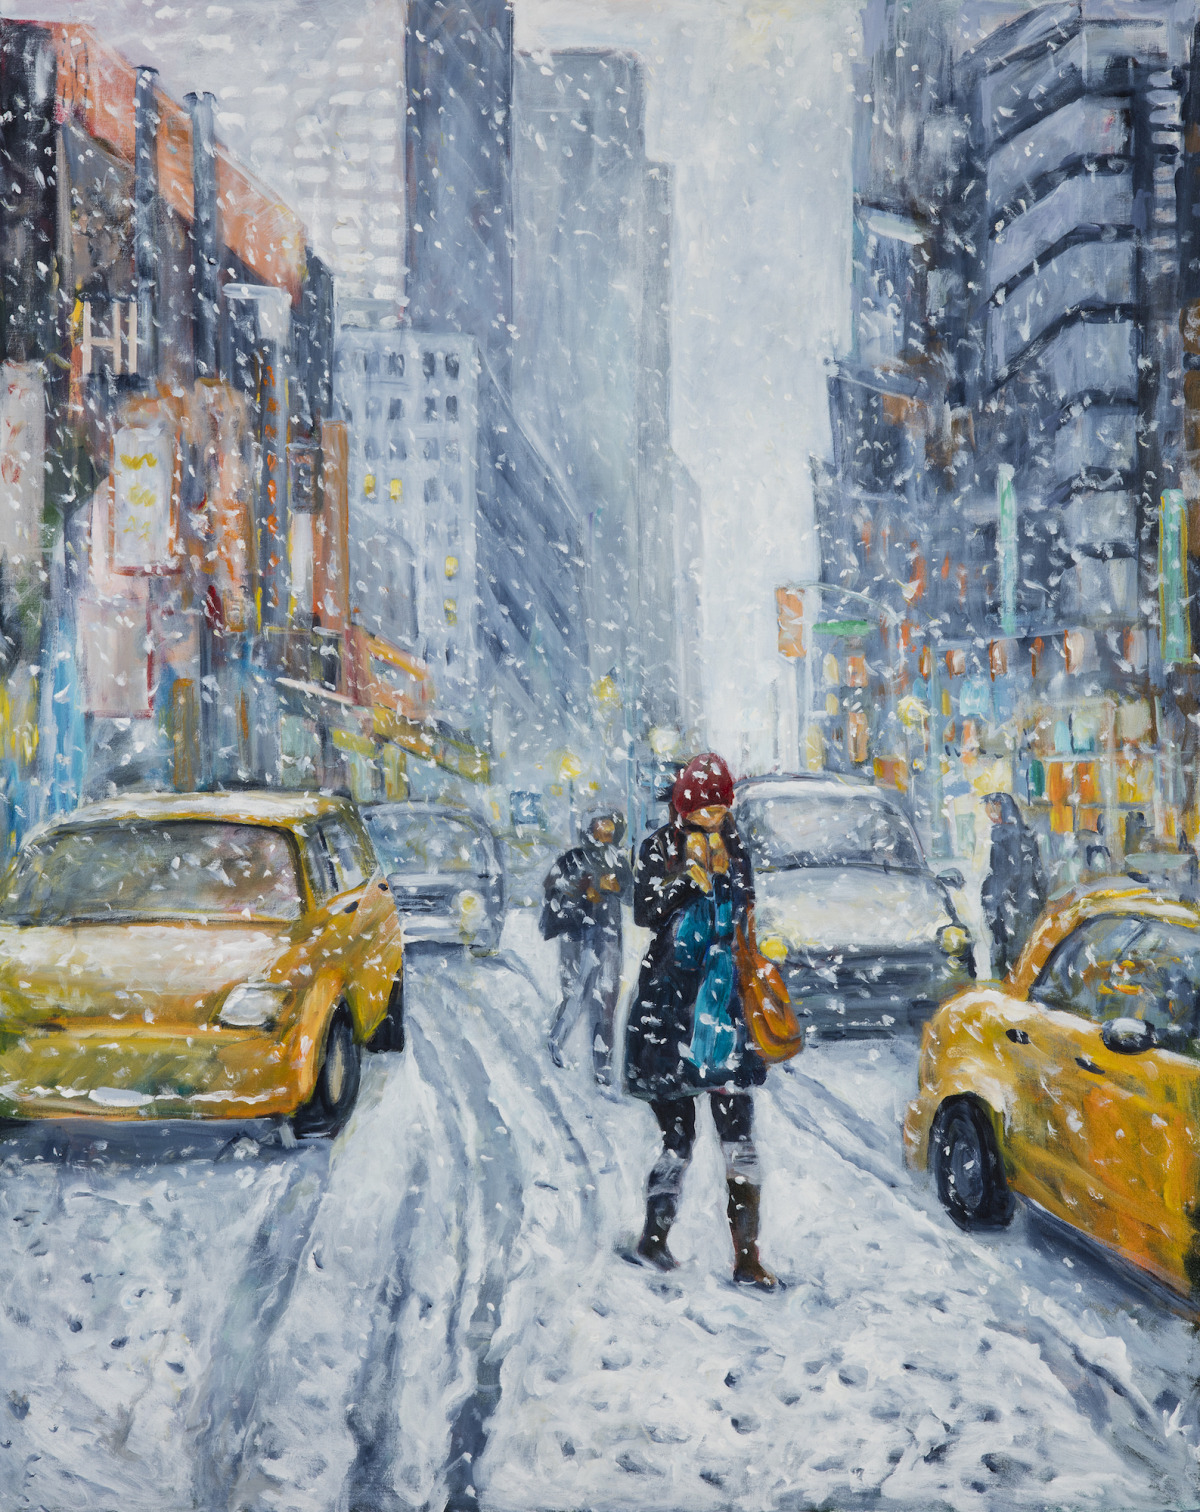 Urban Snowstorm